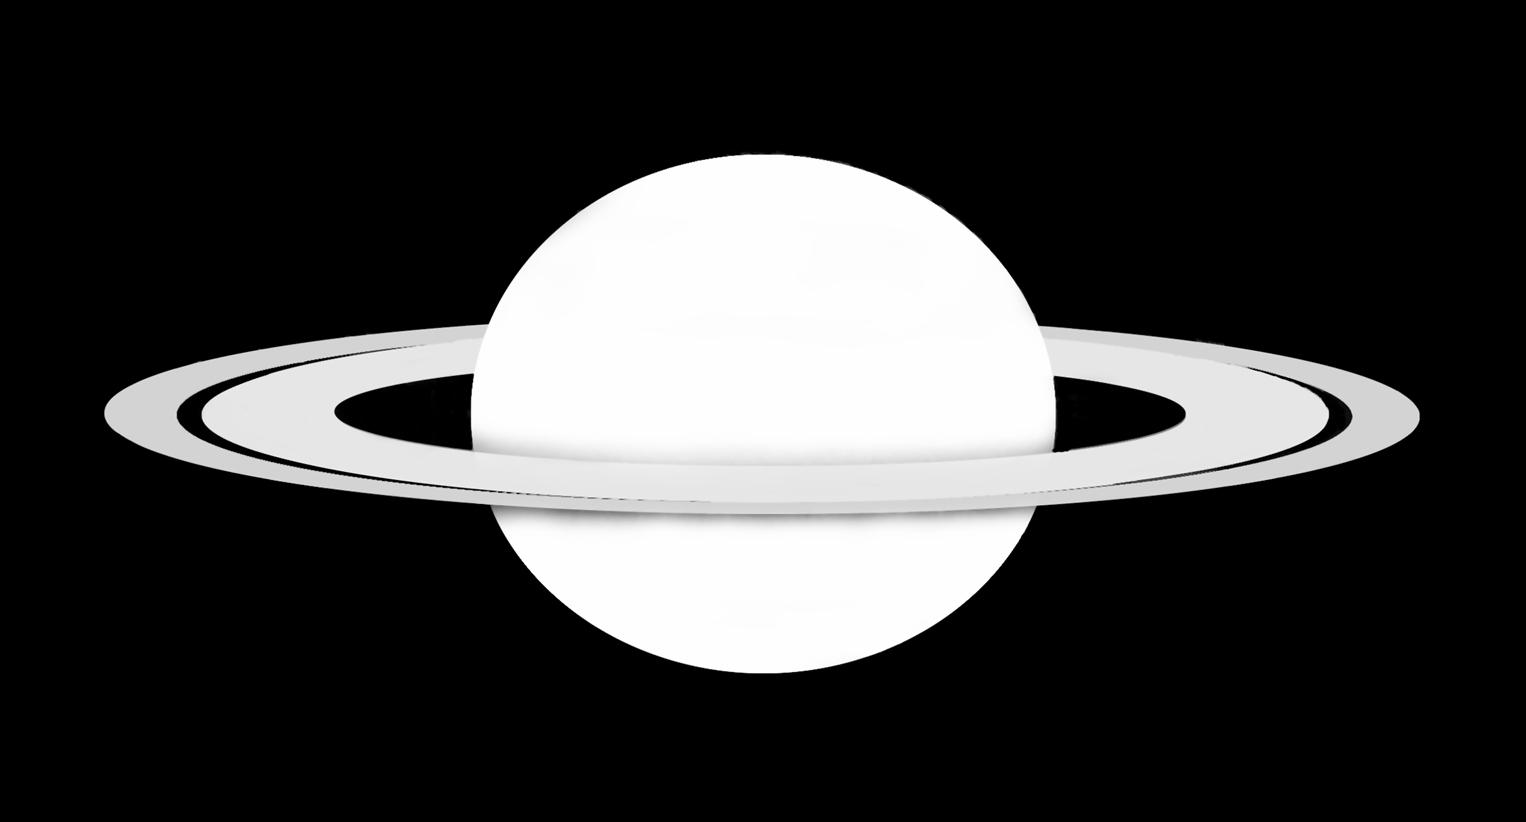 planets in transit robert hand pdf